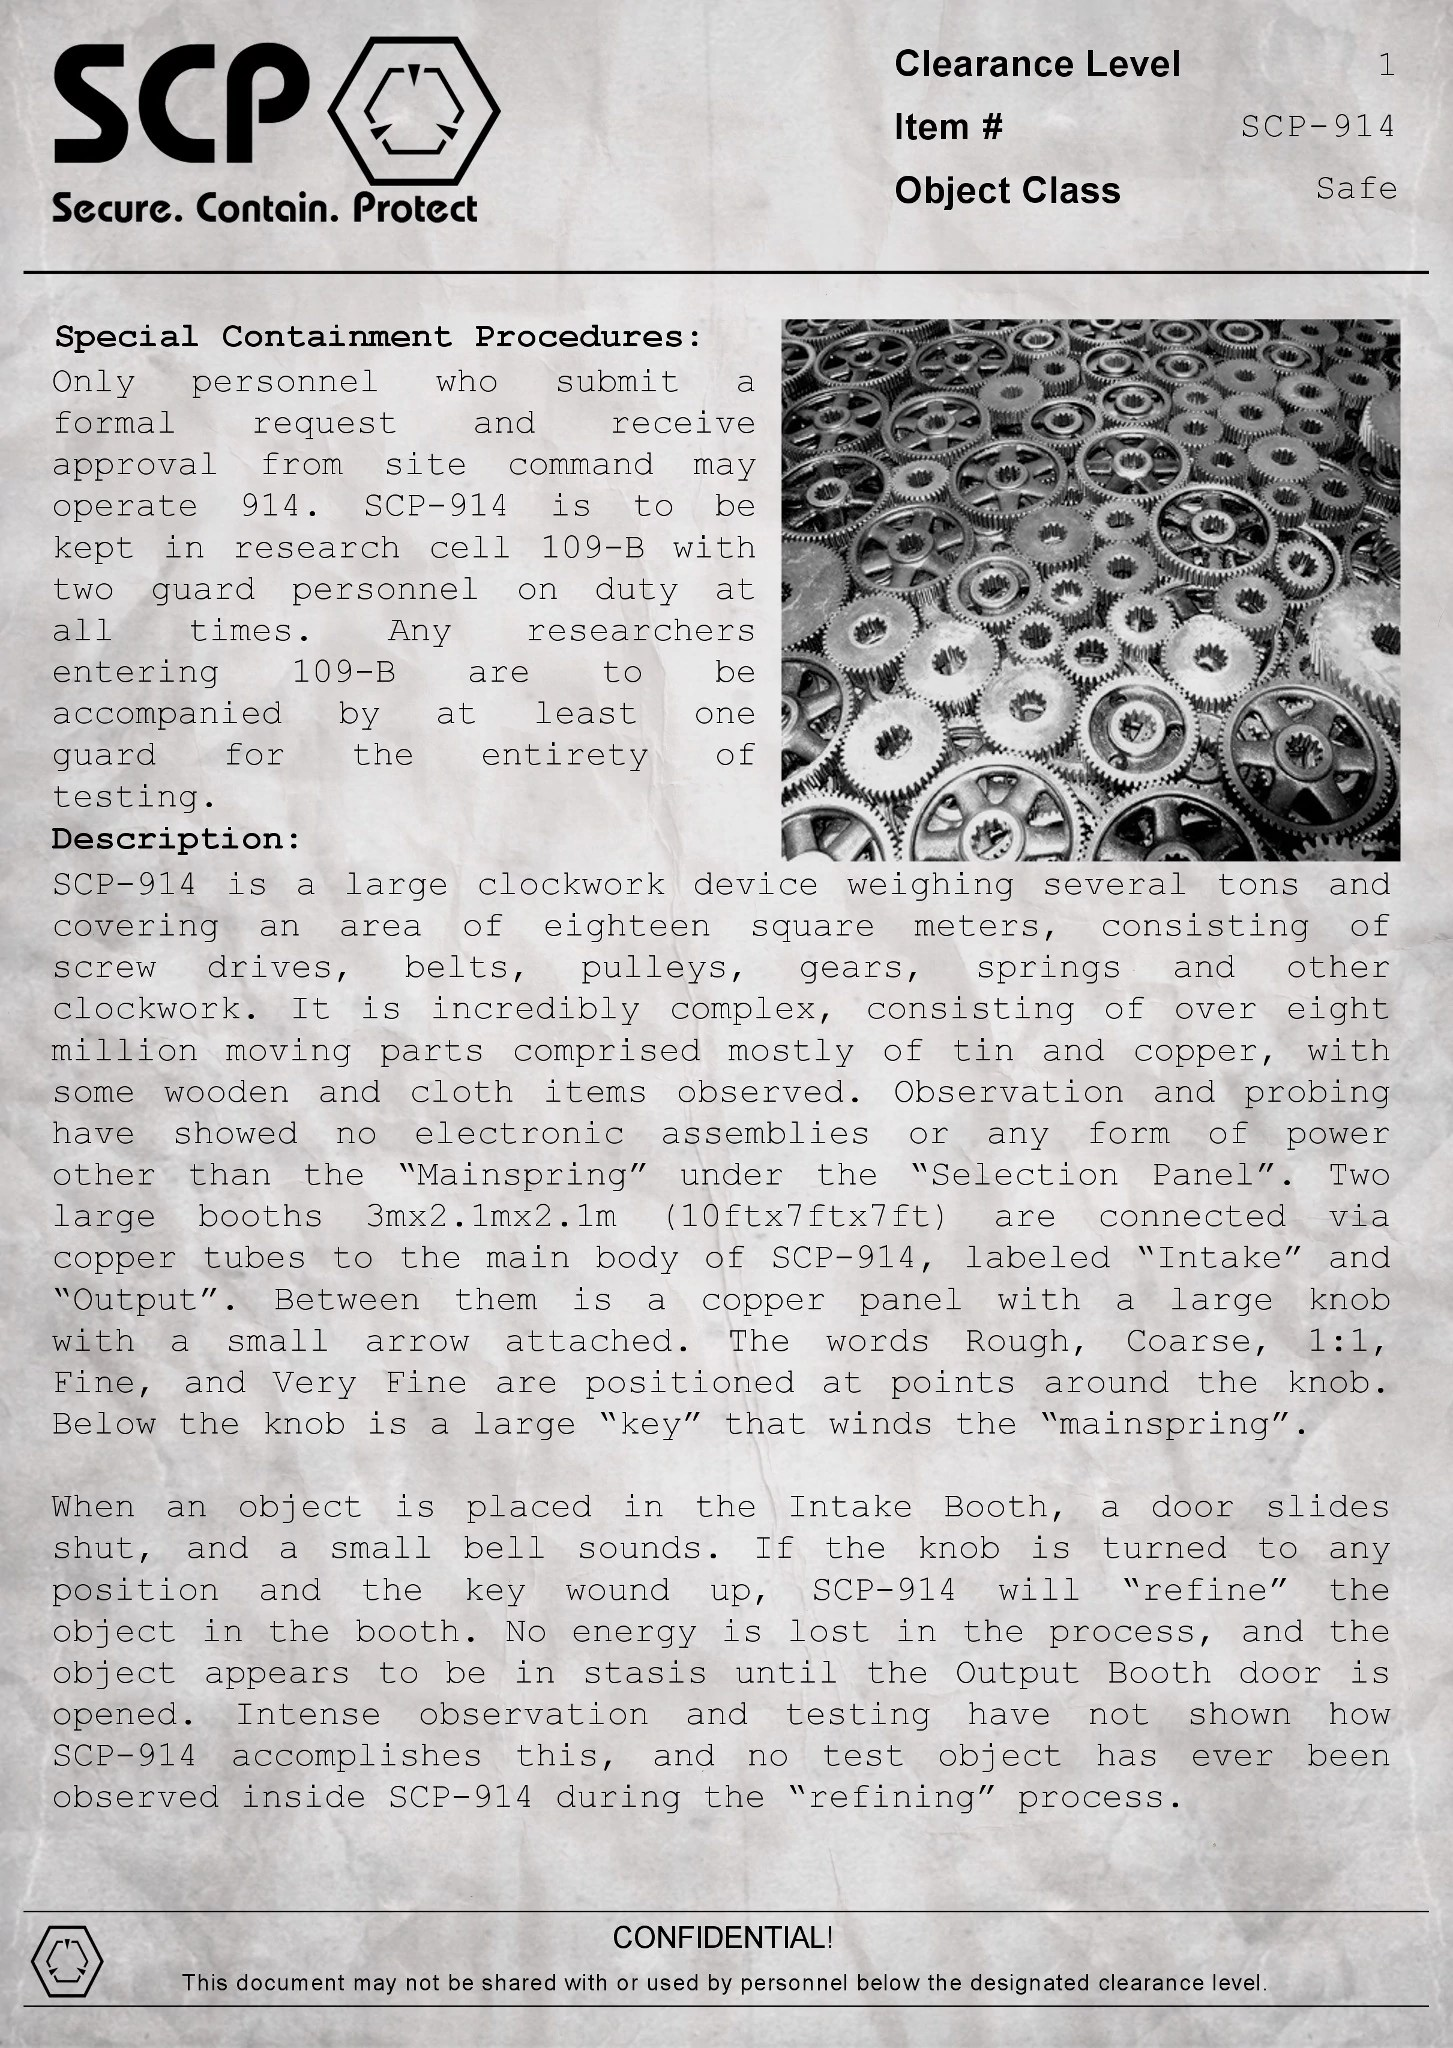 i0 wp com/vignette wikia nocookie net/scp-containm